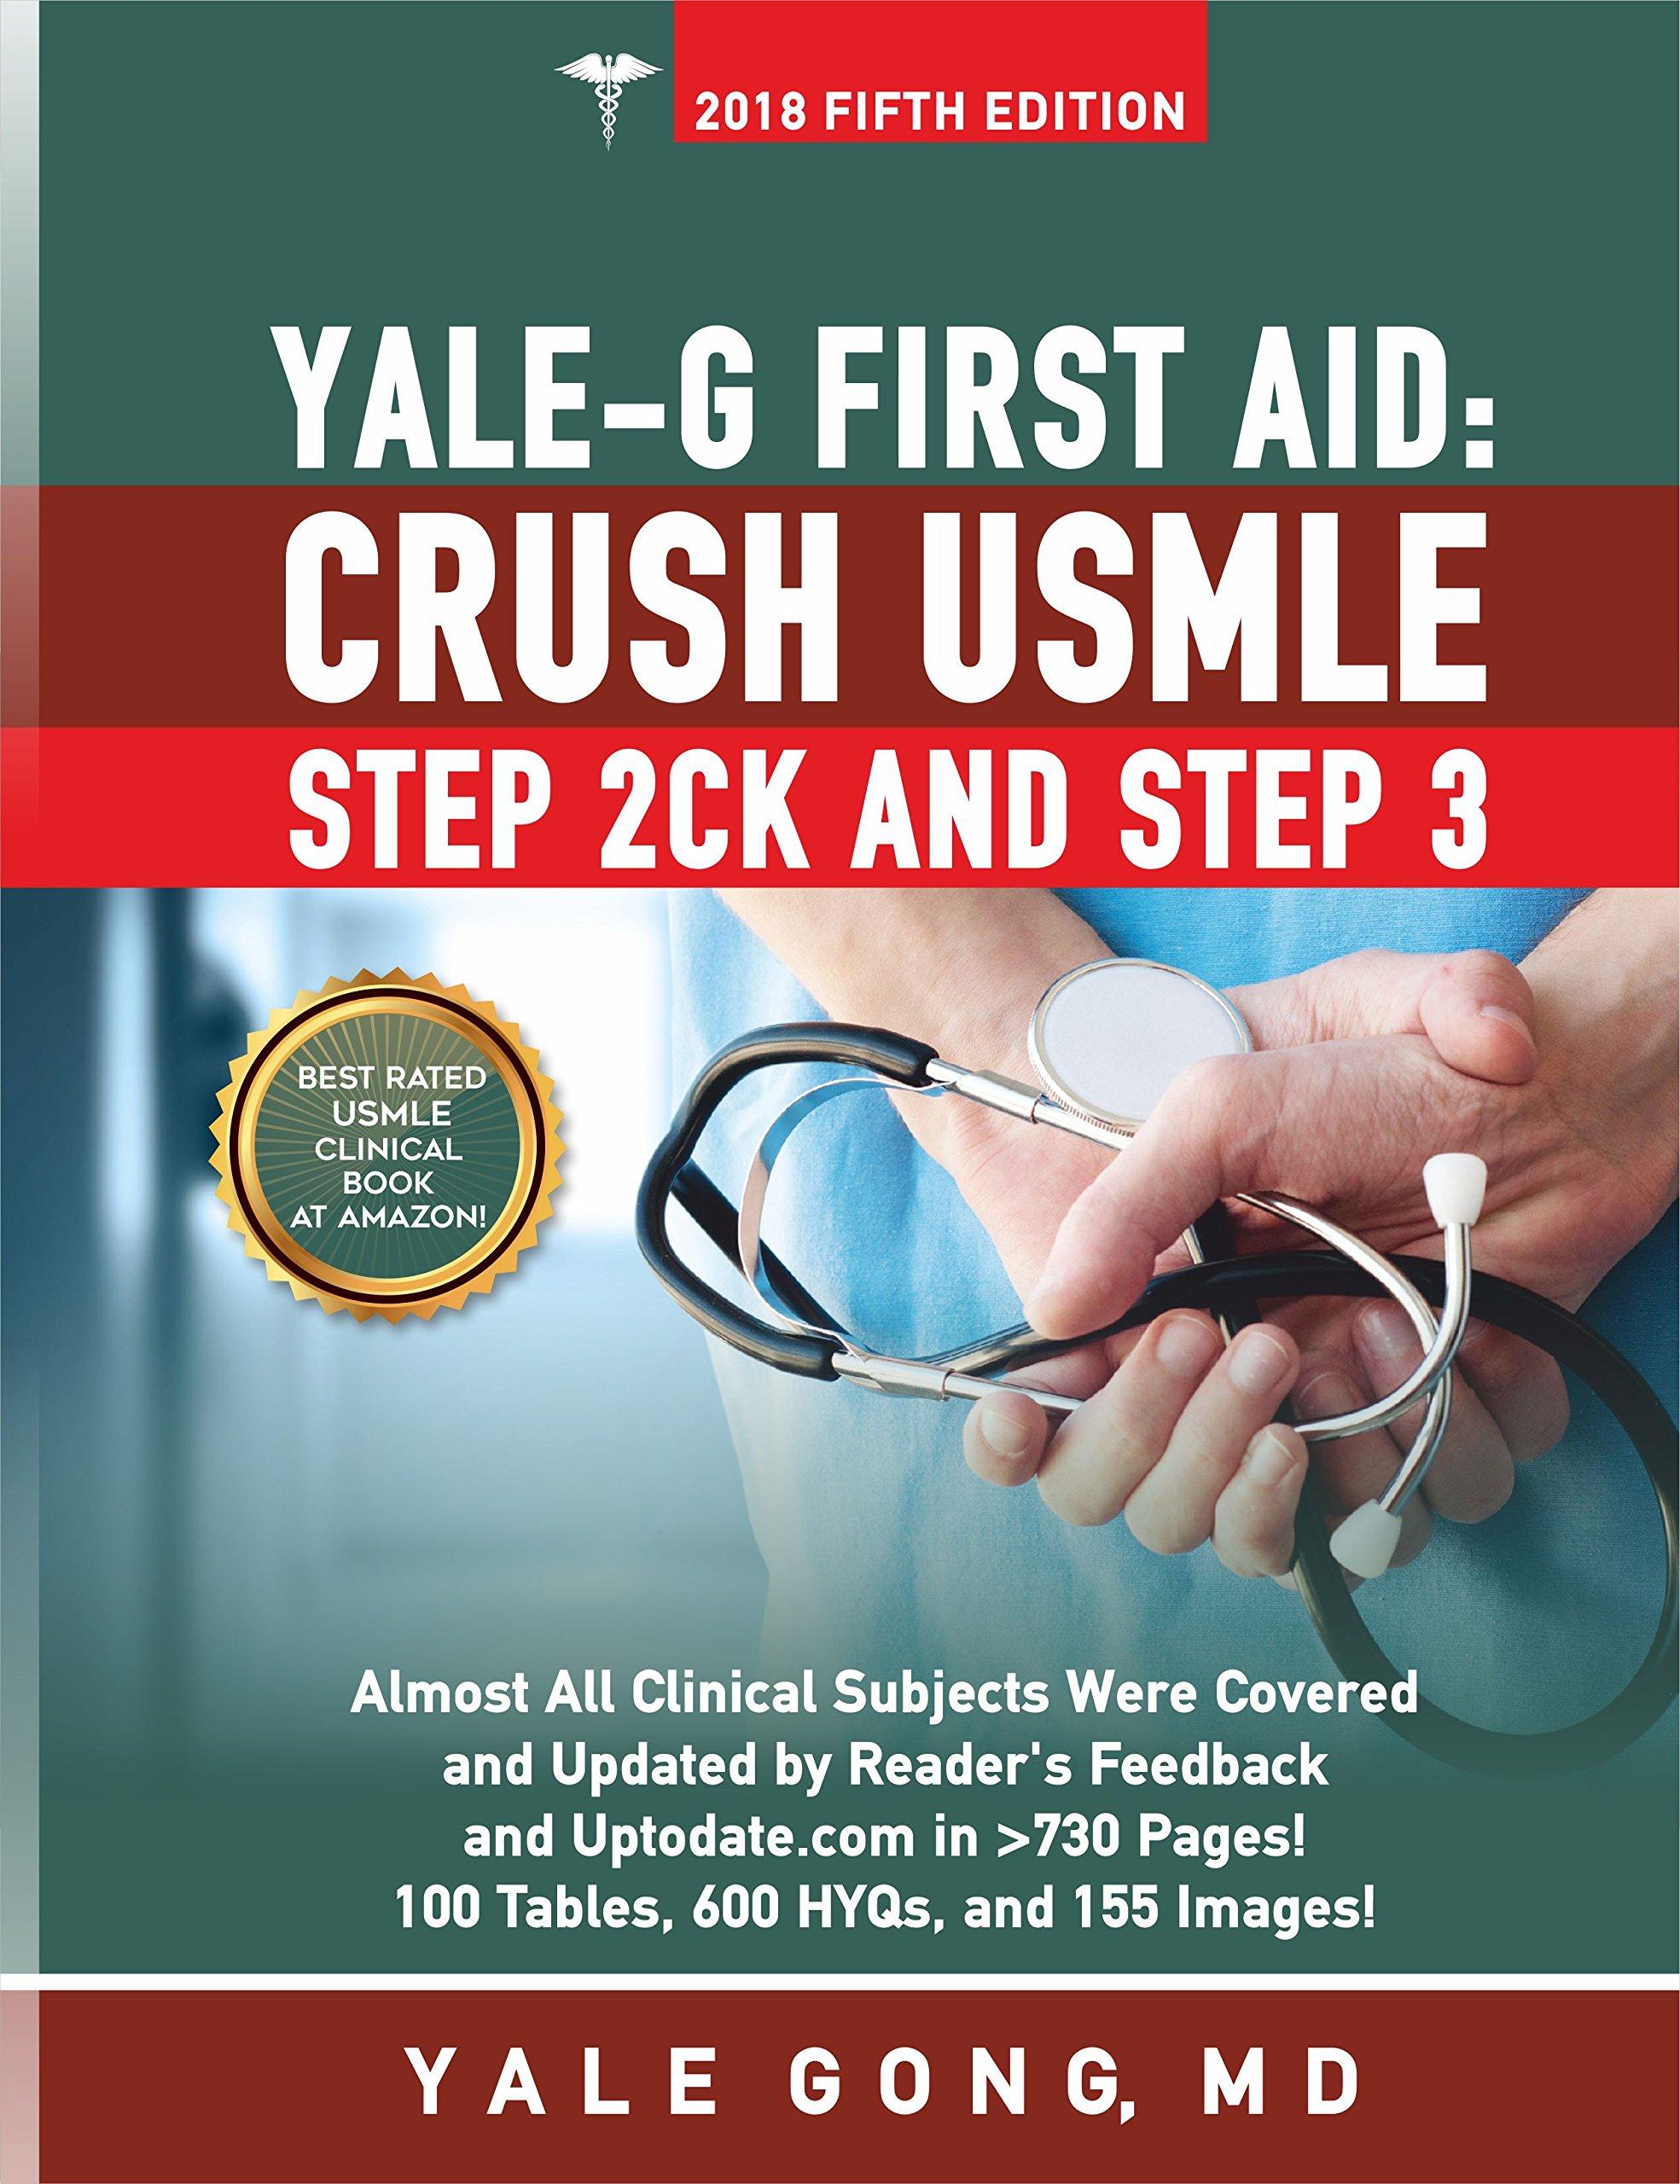 Yale-G First Aid: Crush USMLE Step 2CK & Step 3 (Ed5 Hyperlink